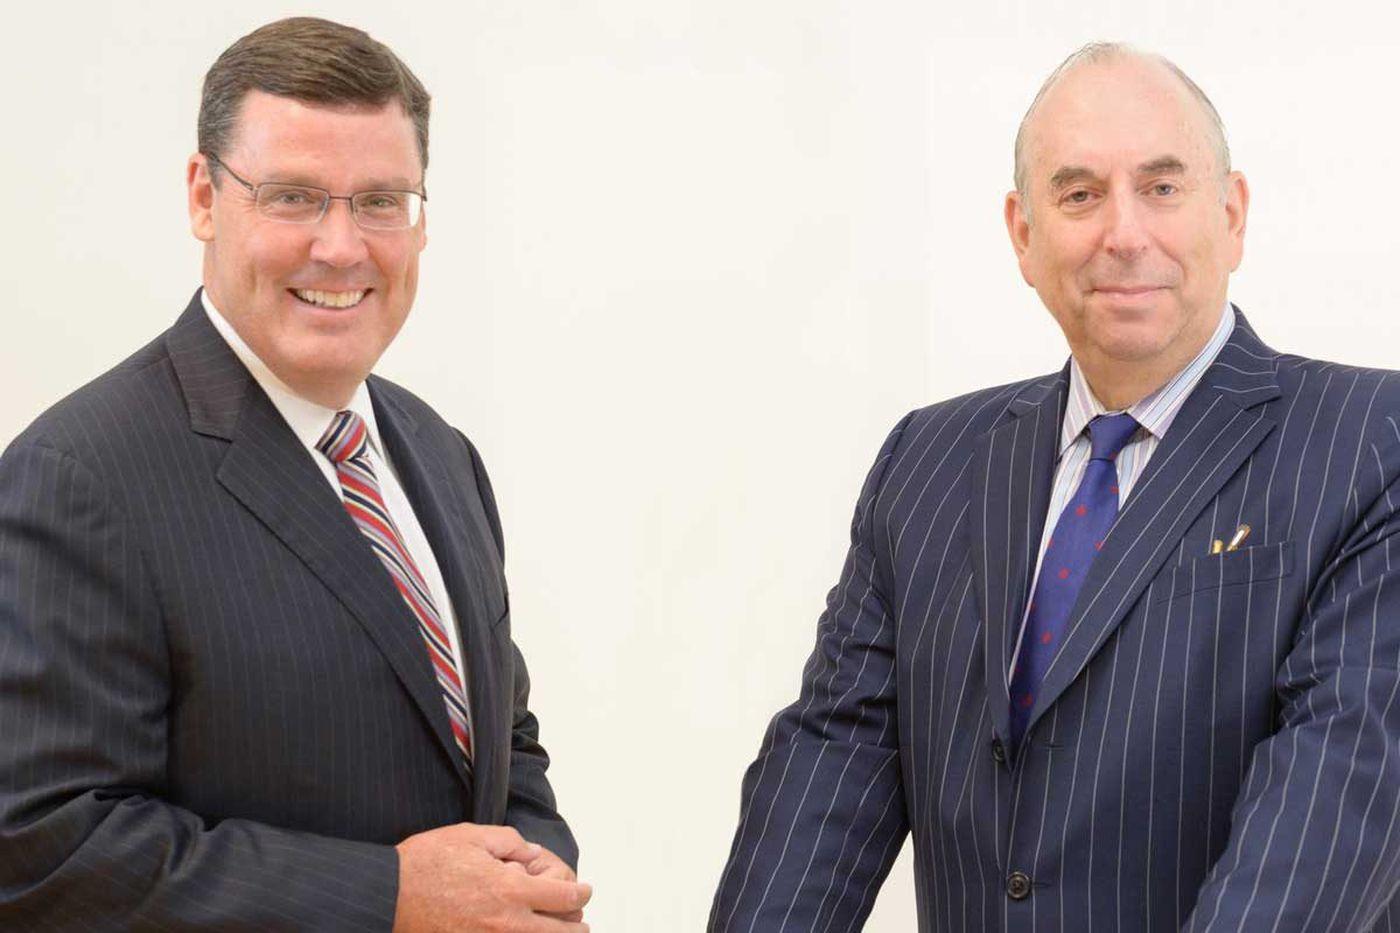 A conversation with Duane Morris' new CEO